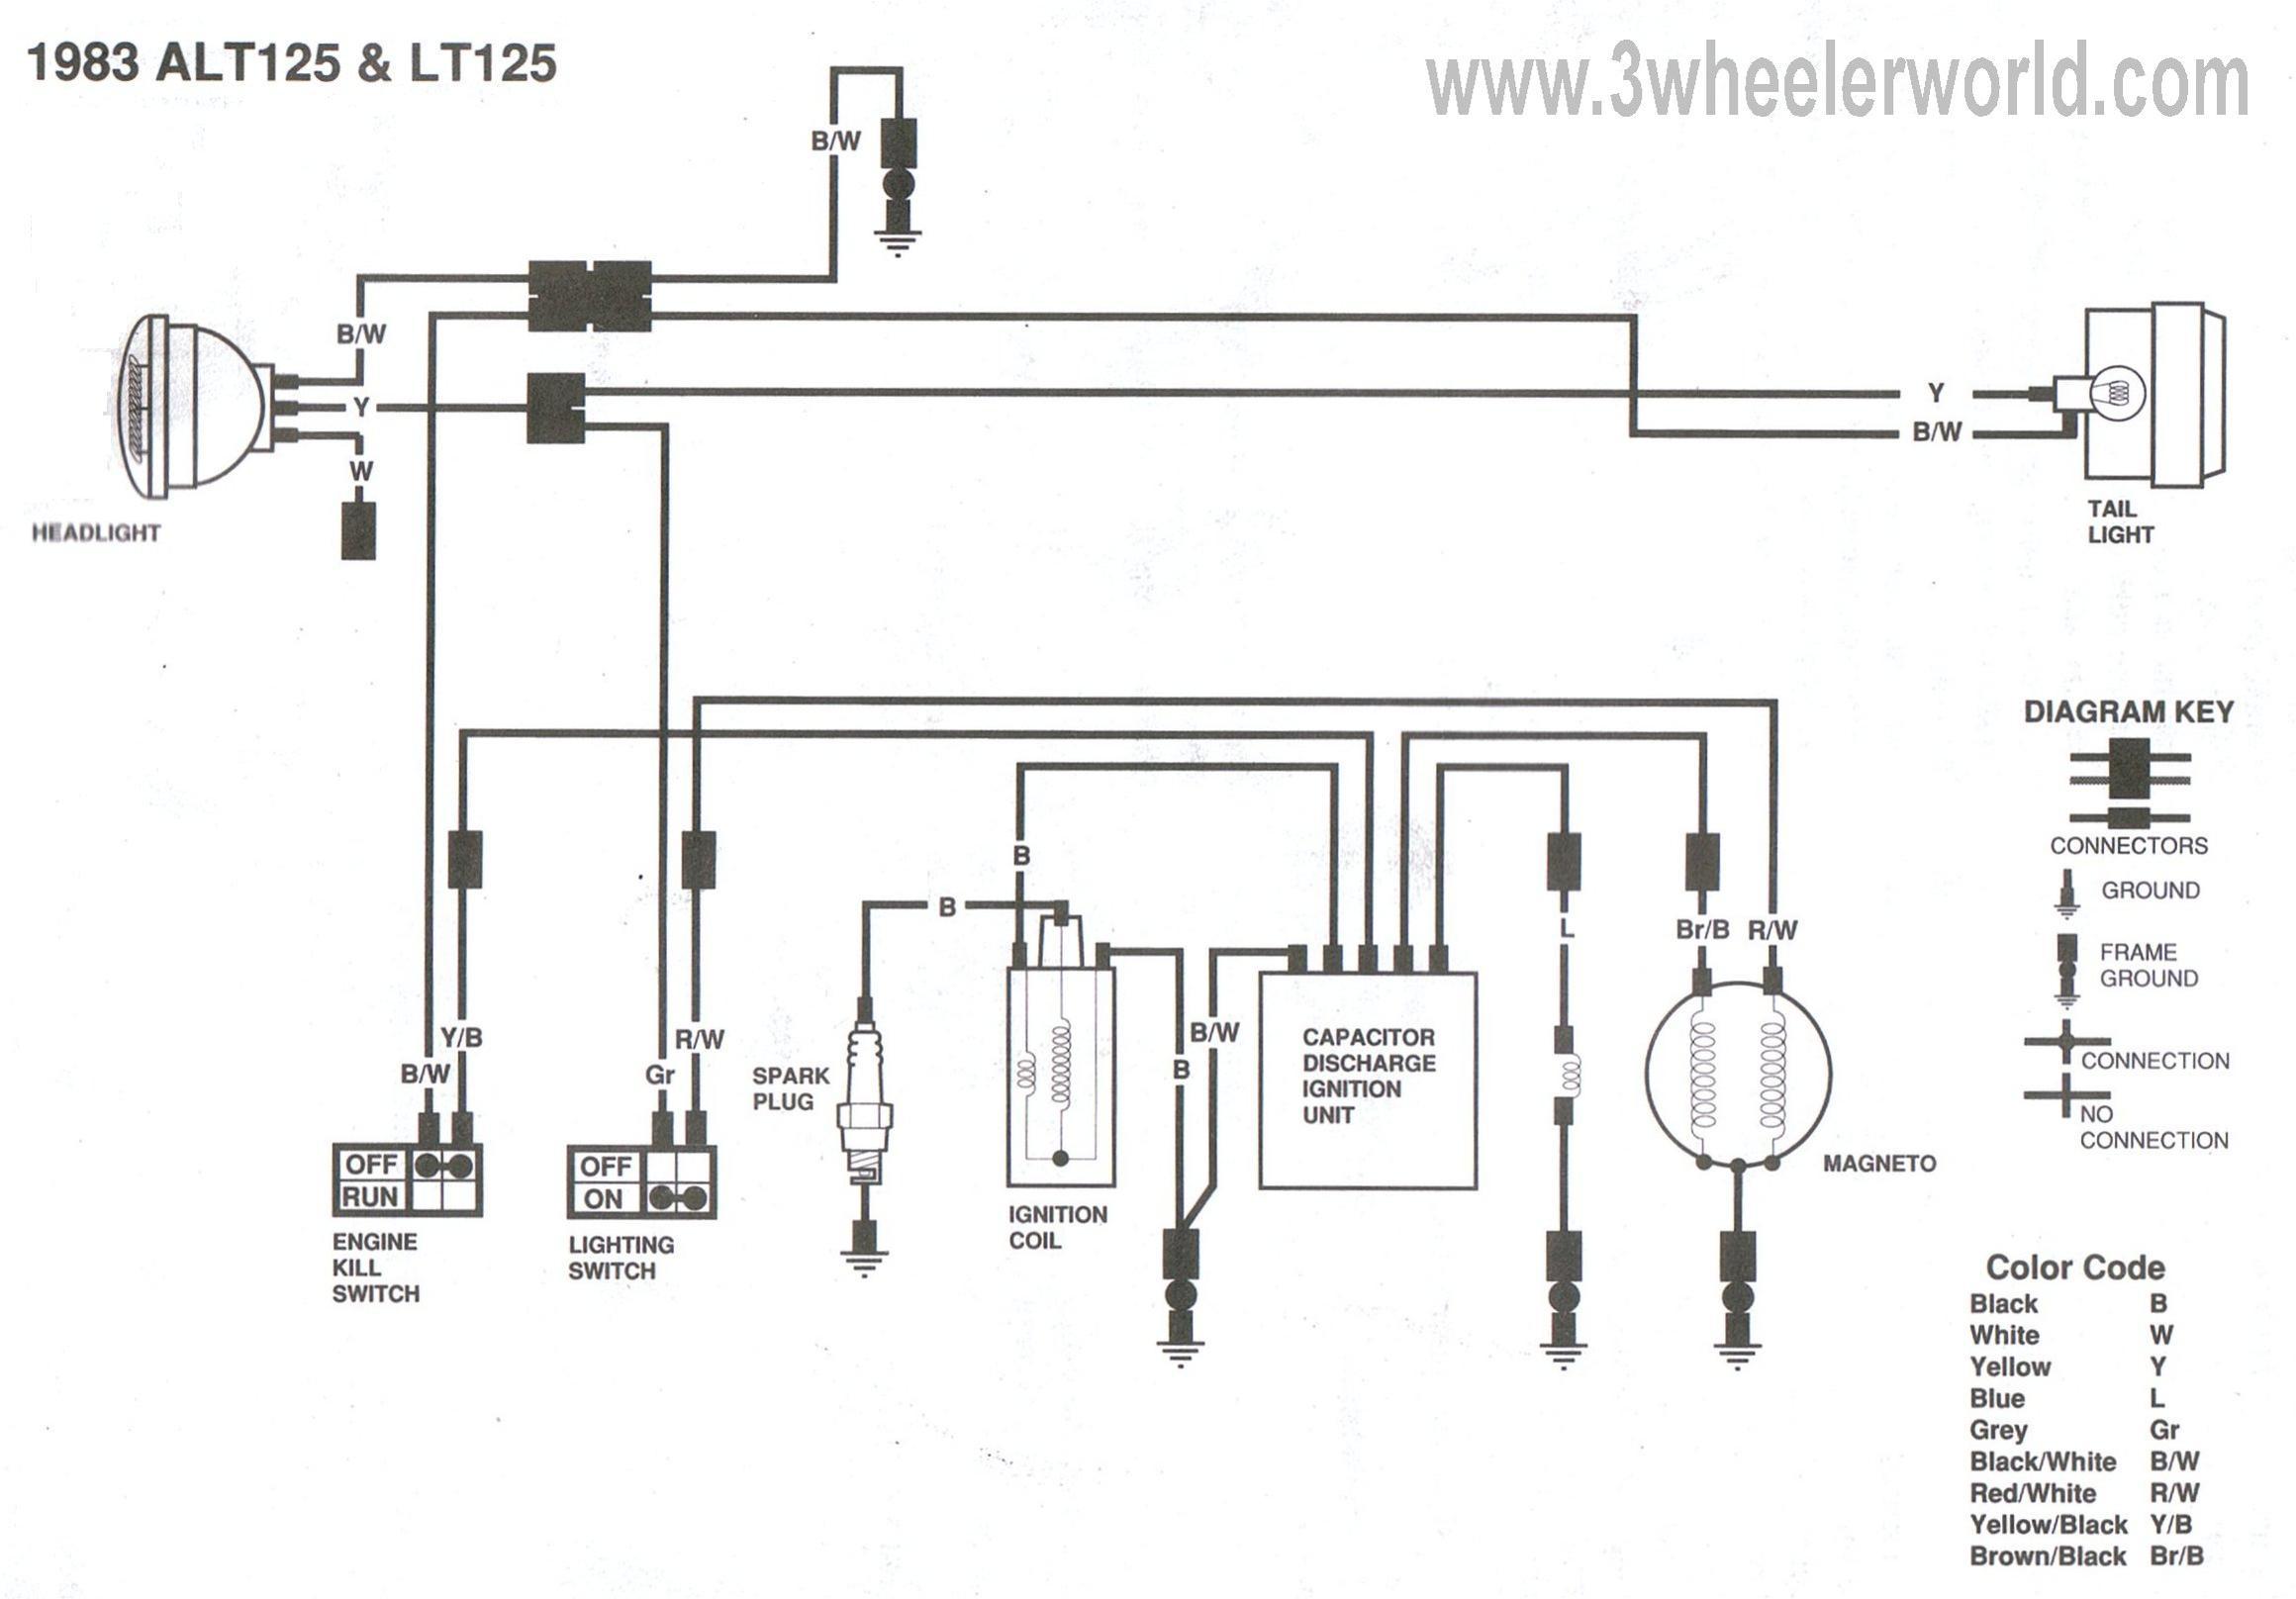 1987 Suzuki Lt F230 Atv Wiring Schematics - 2000 Ford Excursion V10 Fuse  Box Diagram - oonboard.diau.tiralarc-bretagne.frWiring Diagram Resource